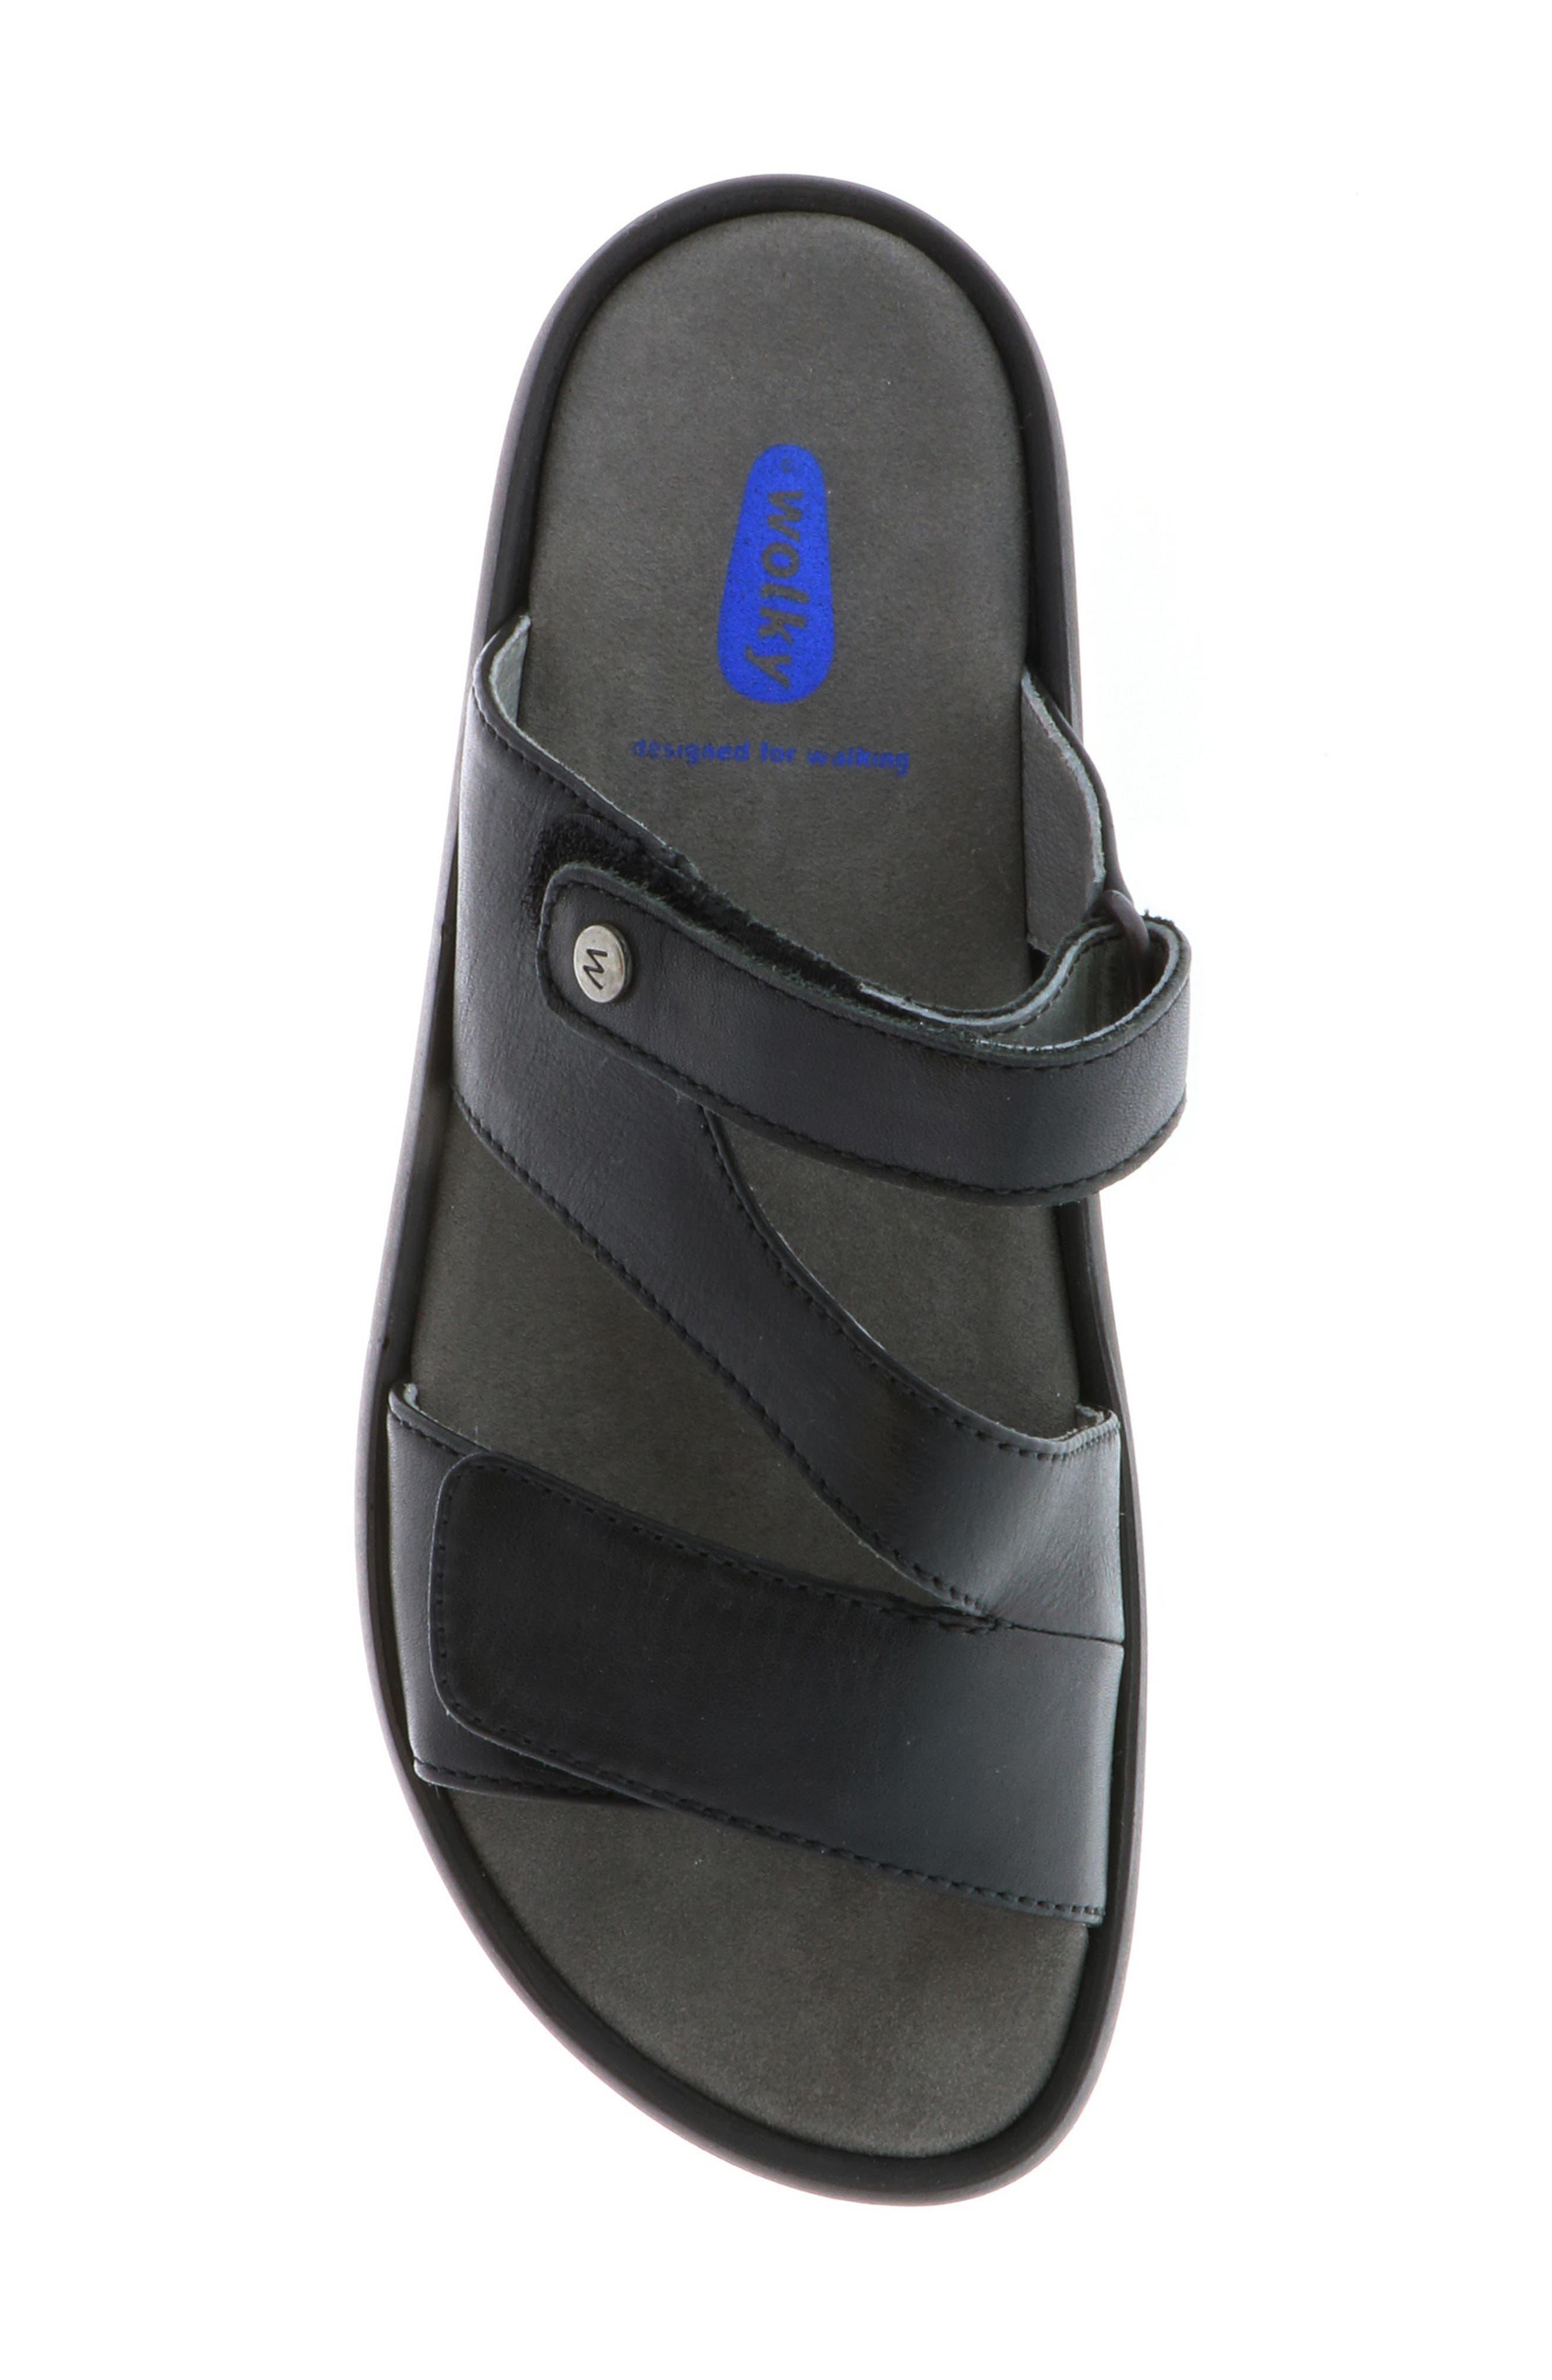 Sense Slide Sandal,                             Alternate thumbnail 5, color,                             BLACK